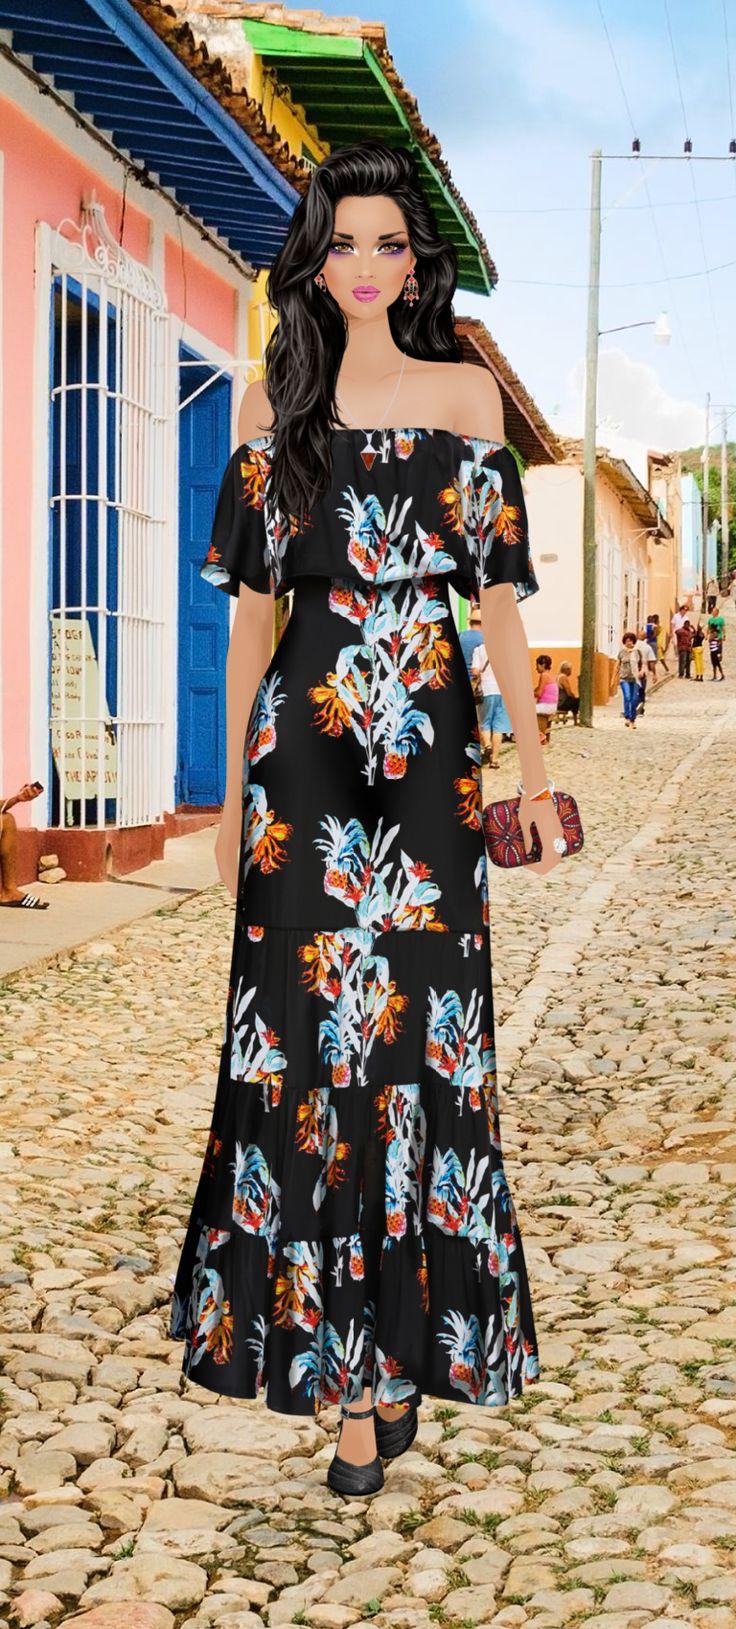 212 Best Covet Fashion Images On Pinterest Covet Fashion Jet Set And Bahia